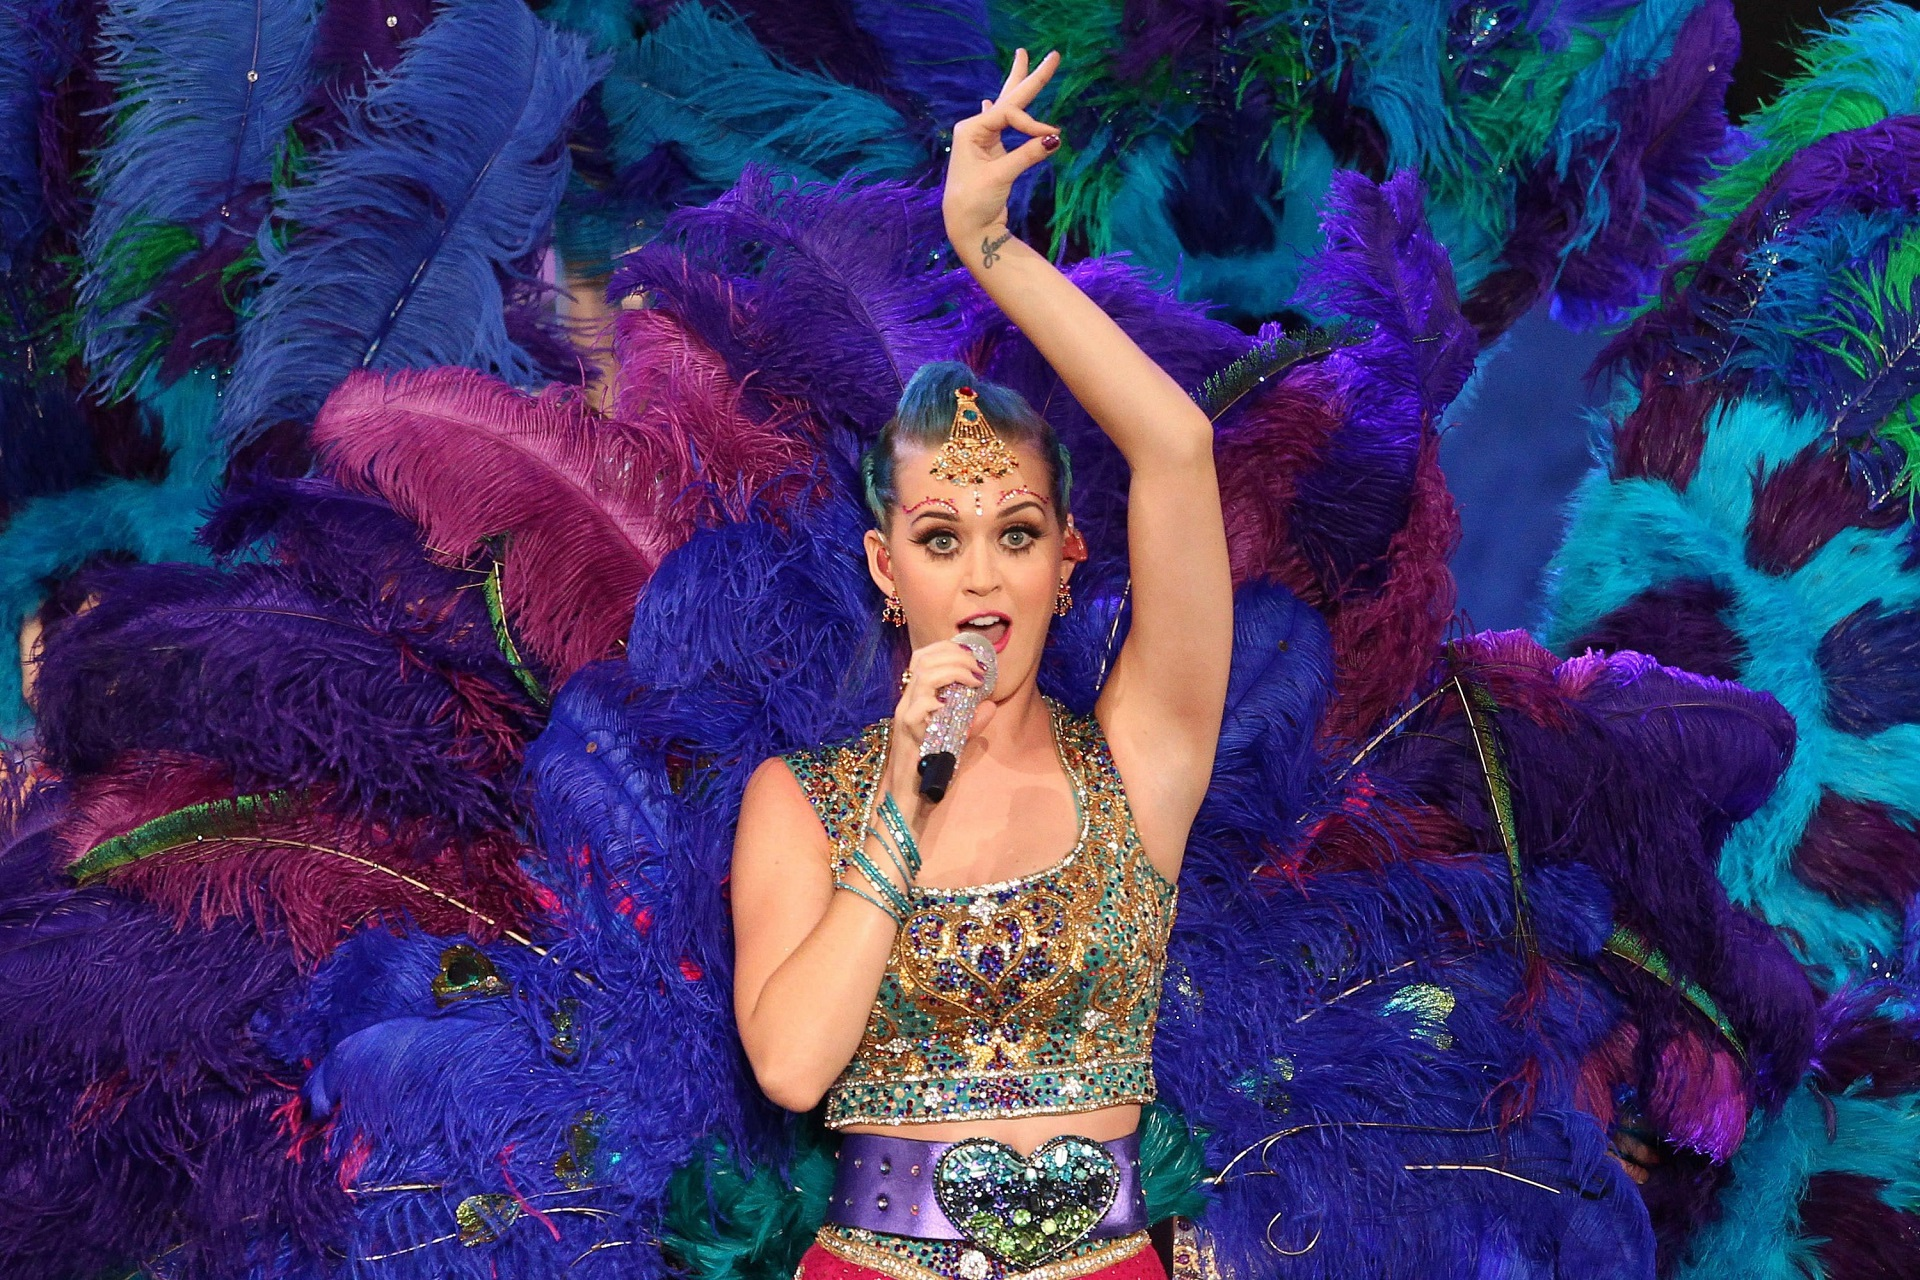 Katy Perry Wallpaper 16